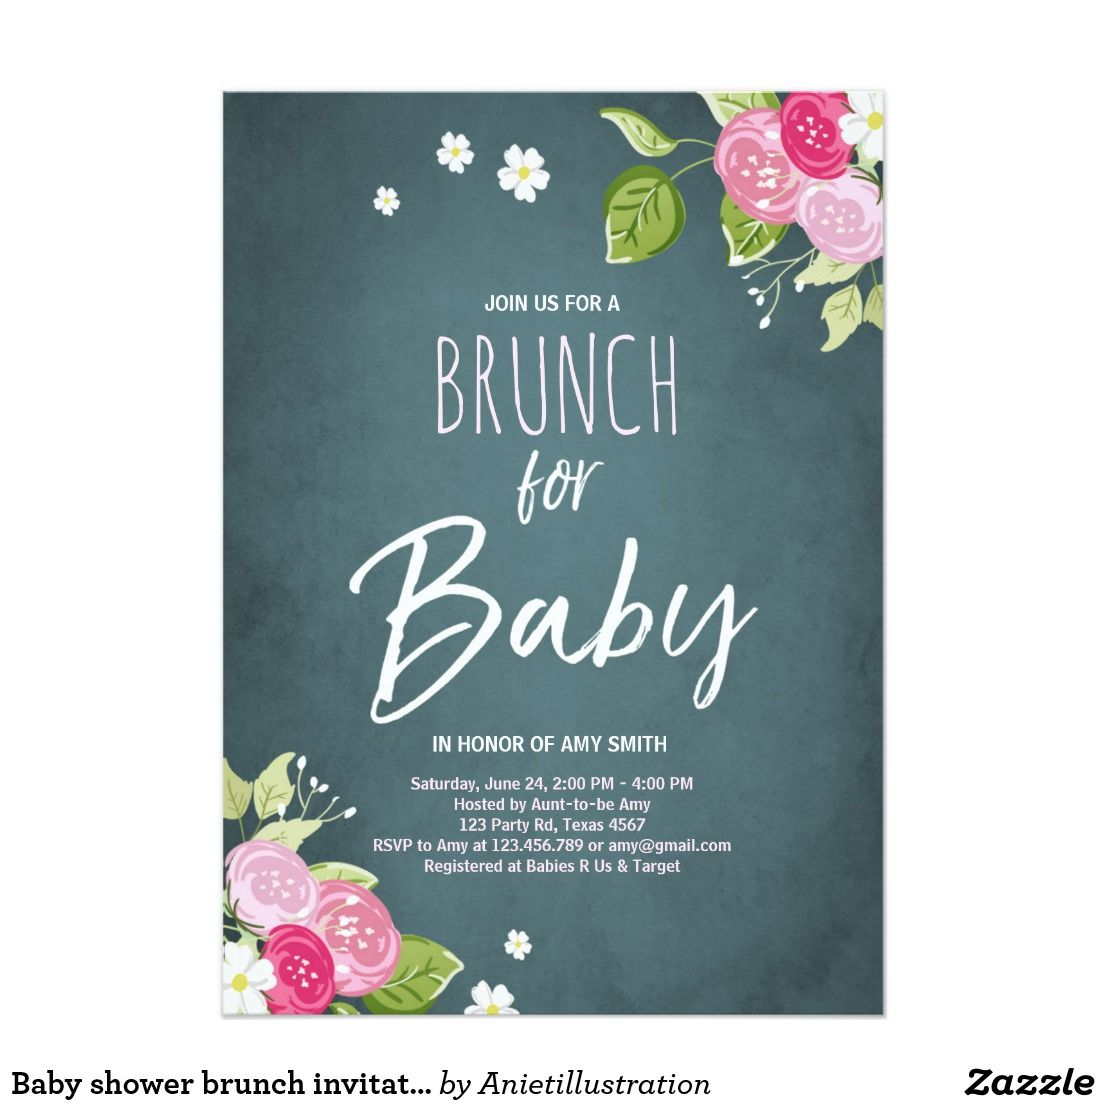 Baby shower brunch invitation Floral Rustic Pink | Baby Shower ...